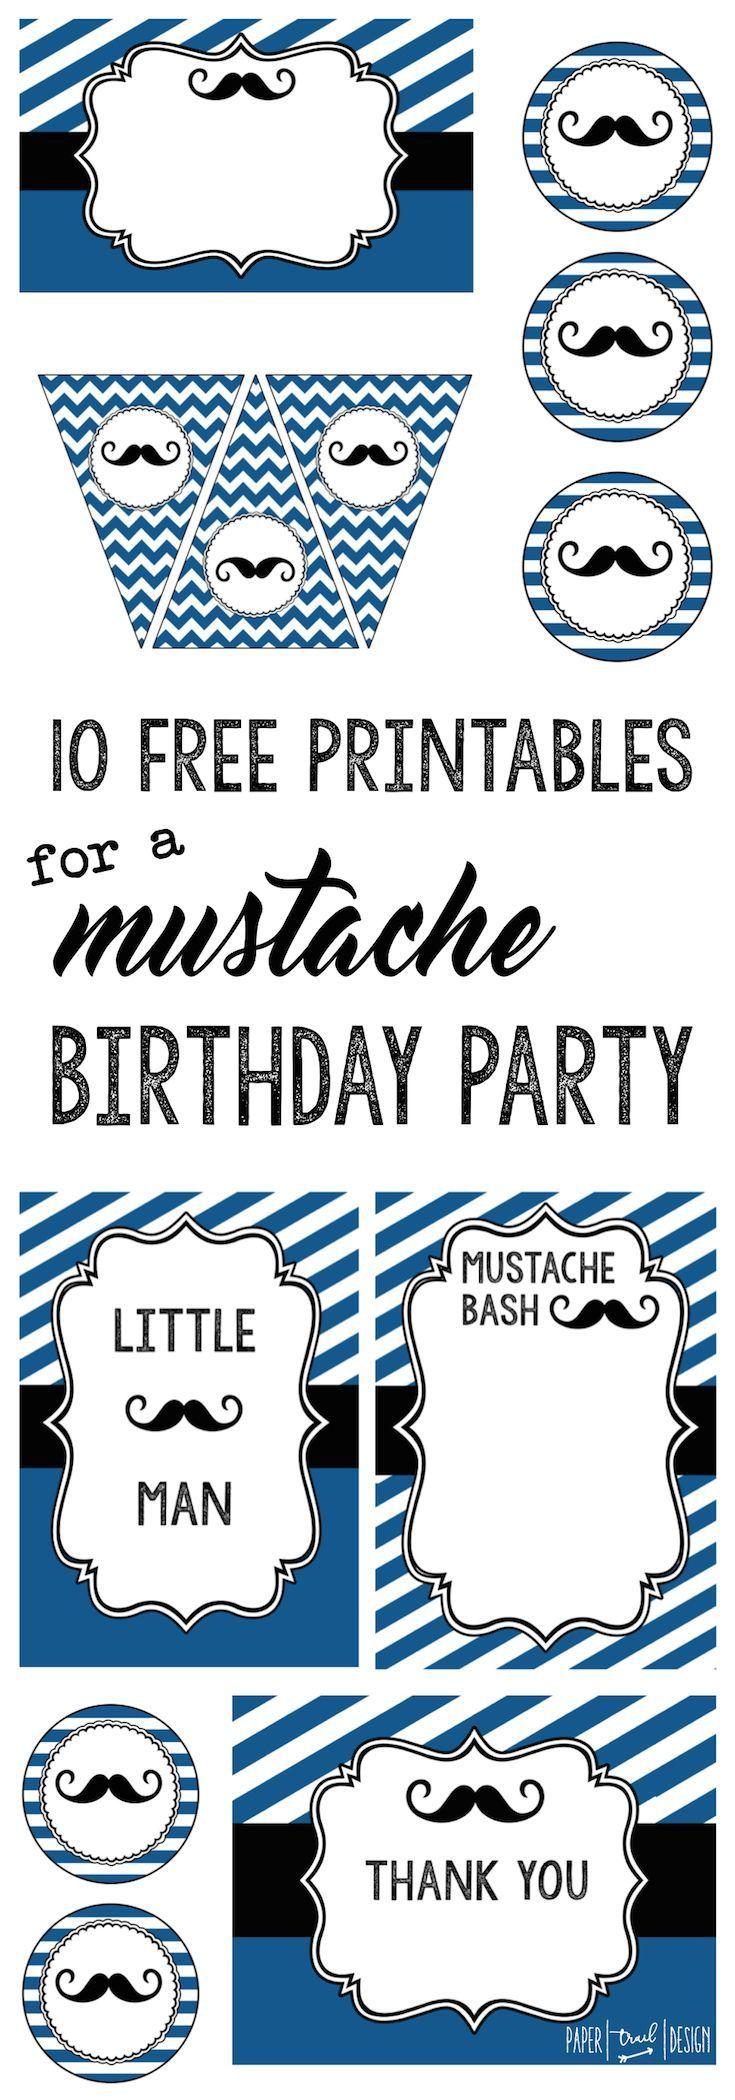 Mustache Party: 10 Free Printables | Mustache cupcakes, Mustache ...